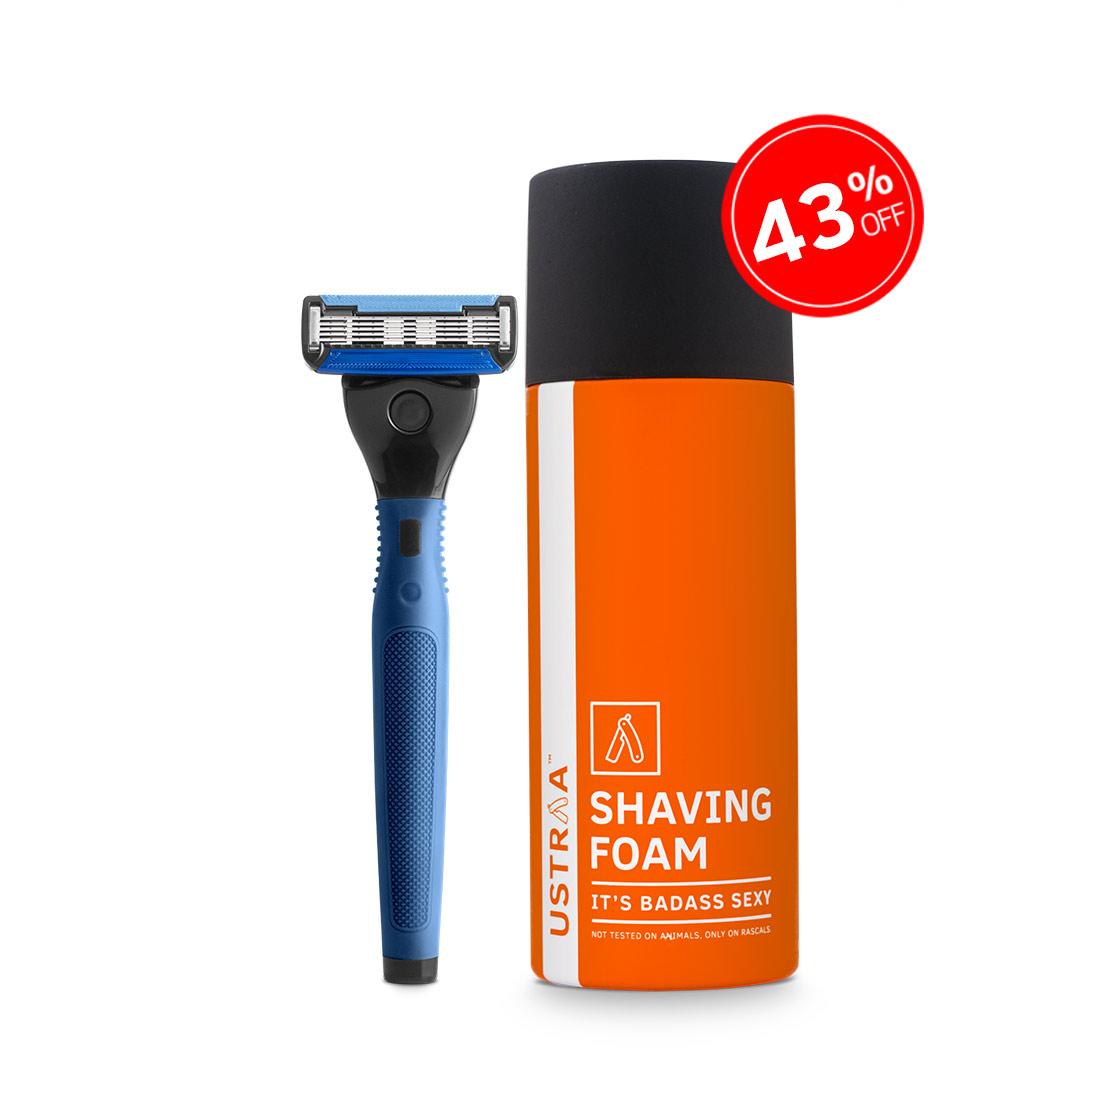 Gear 5 Razor(Blue) and Shaving Foam(Badass Sexy)